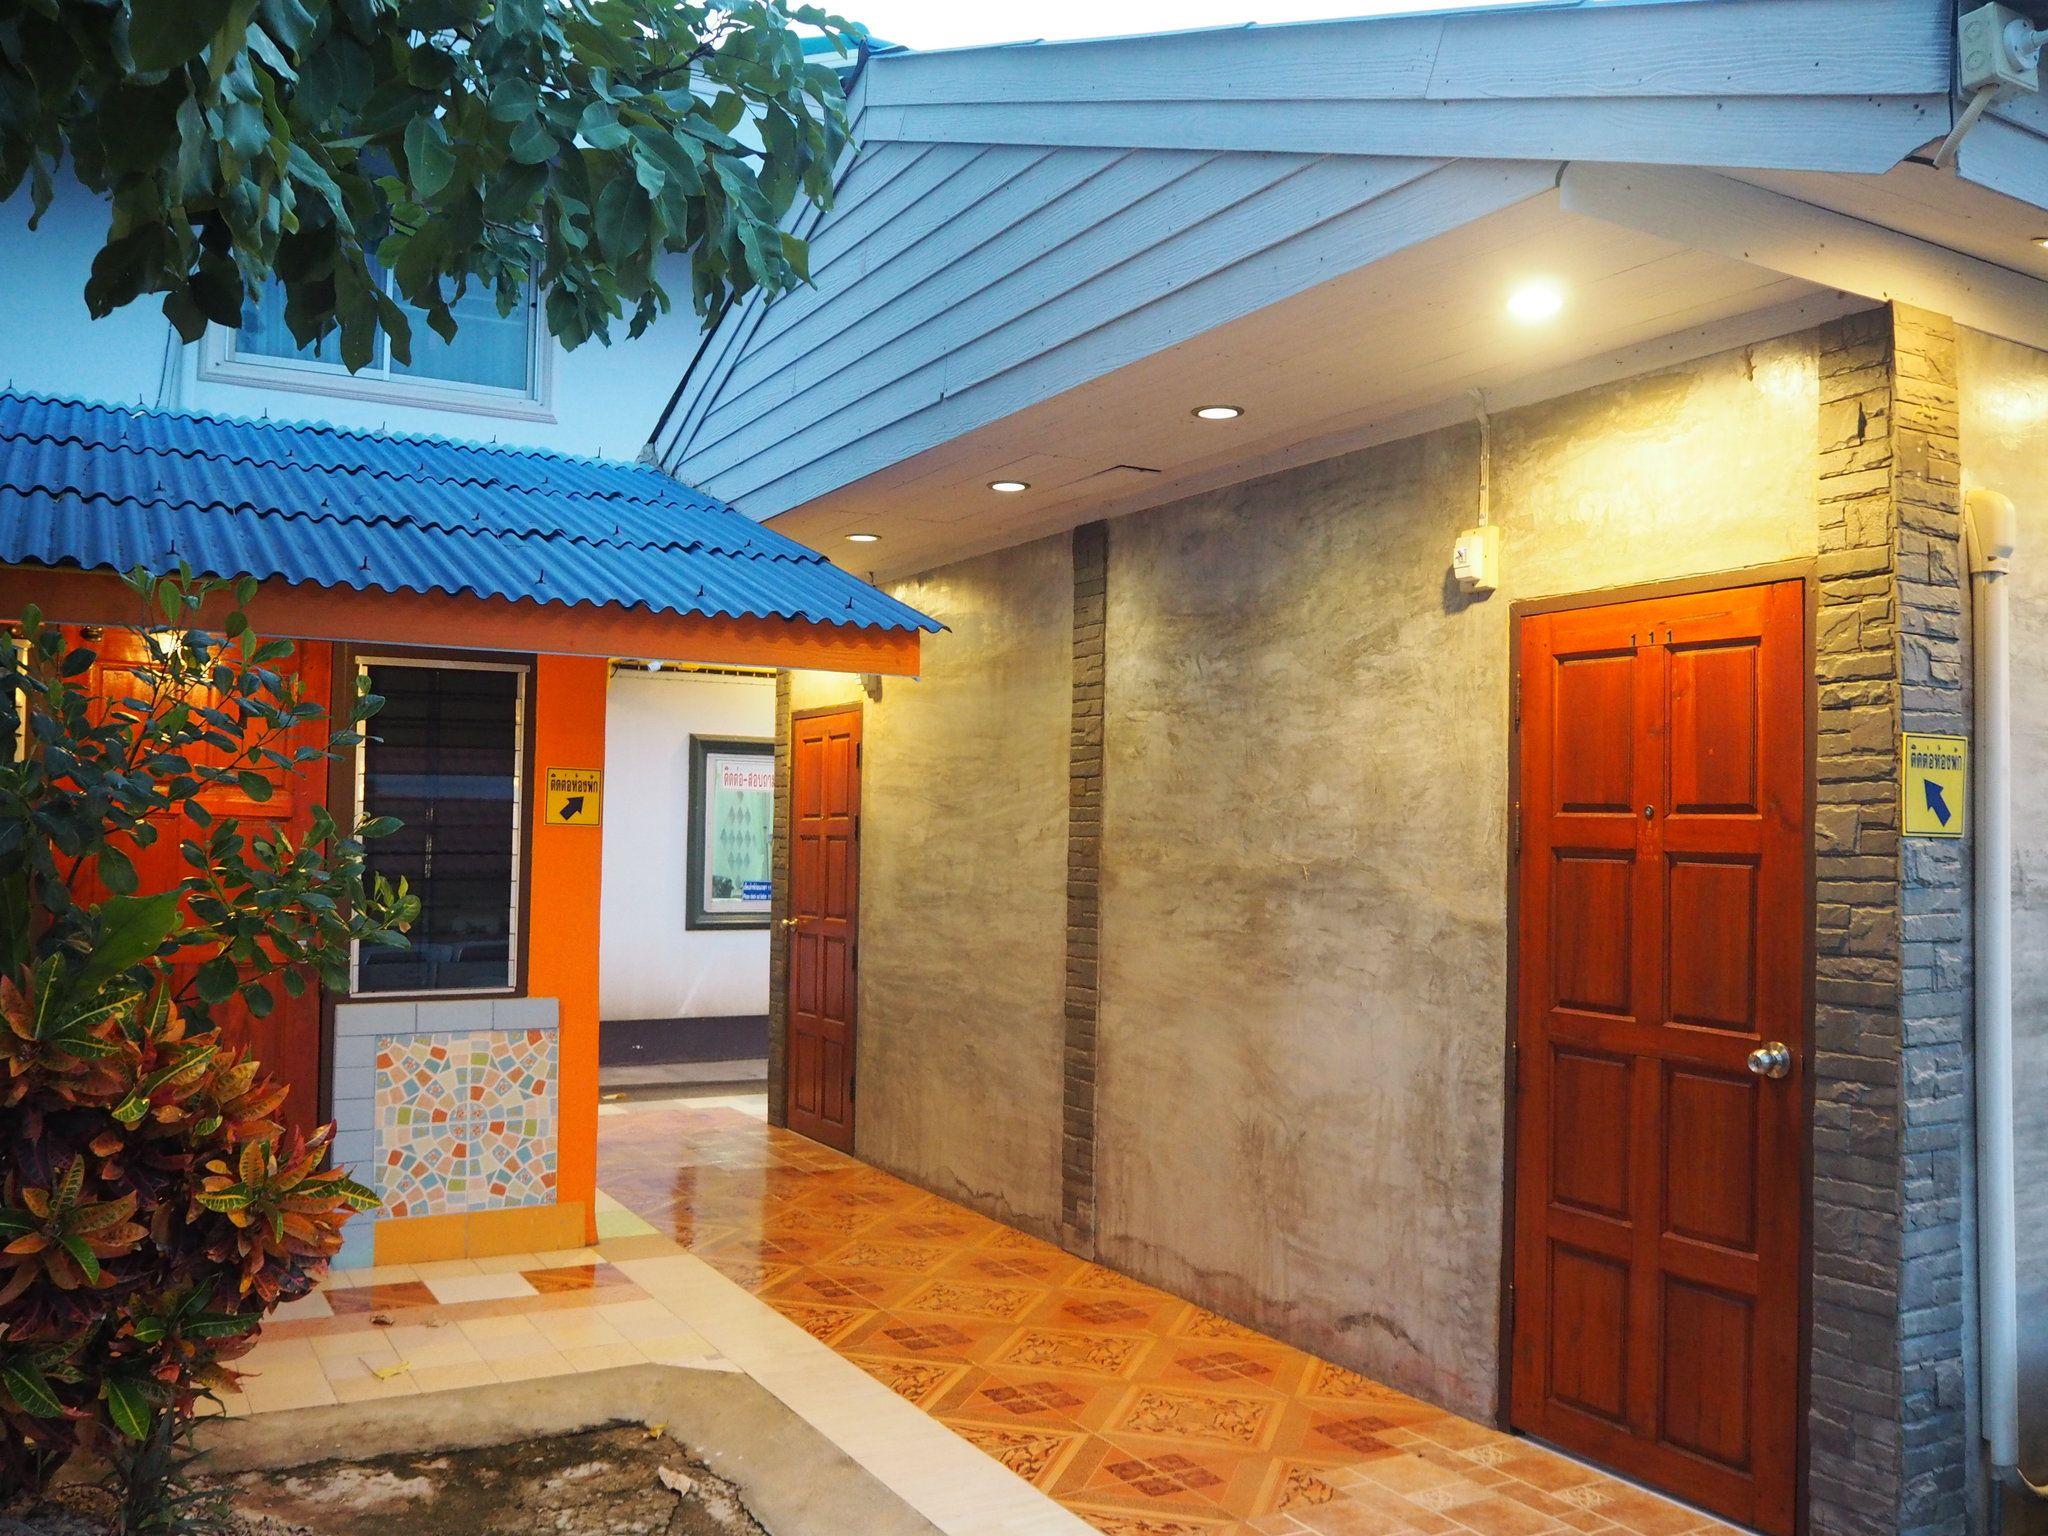 Tonpai Guesthouse